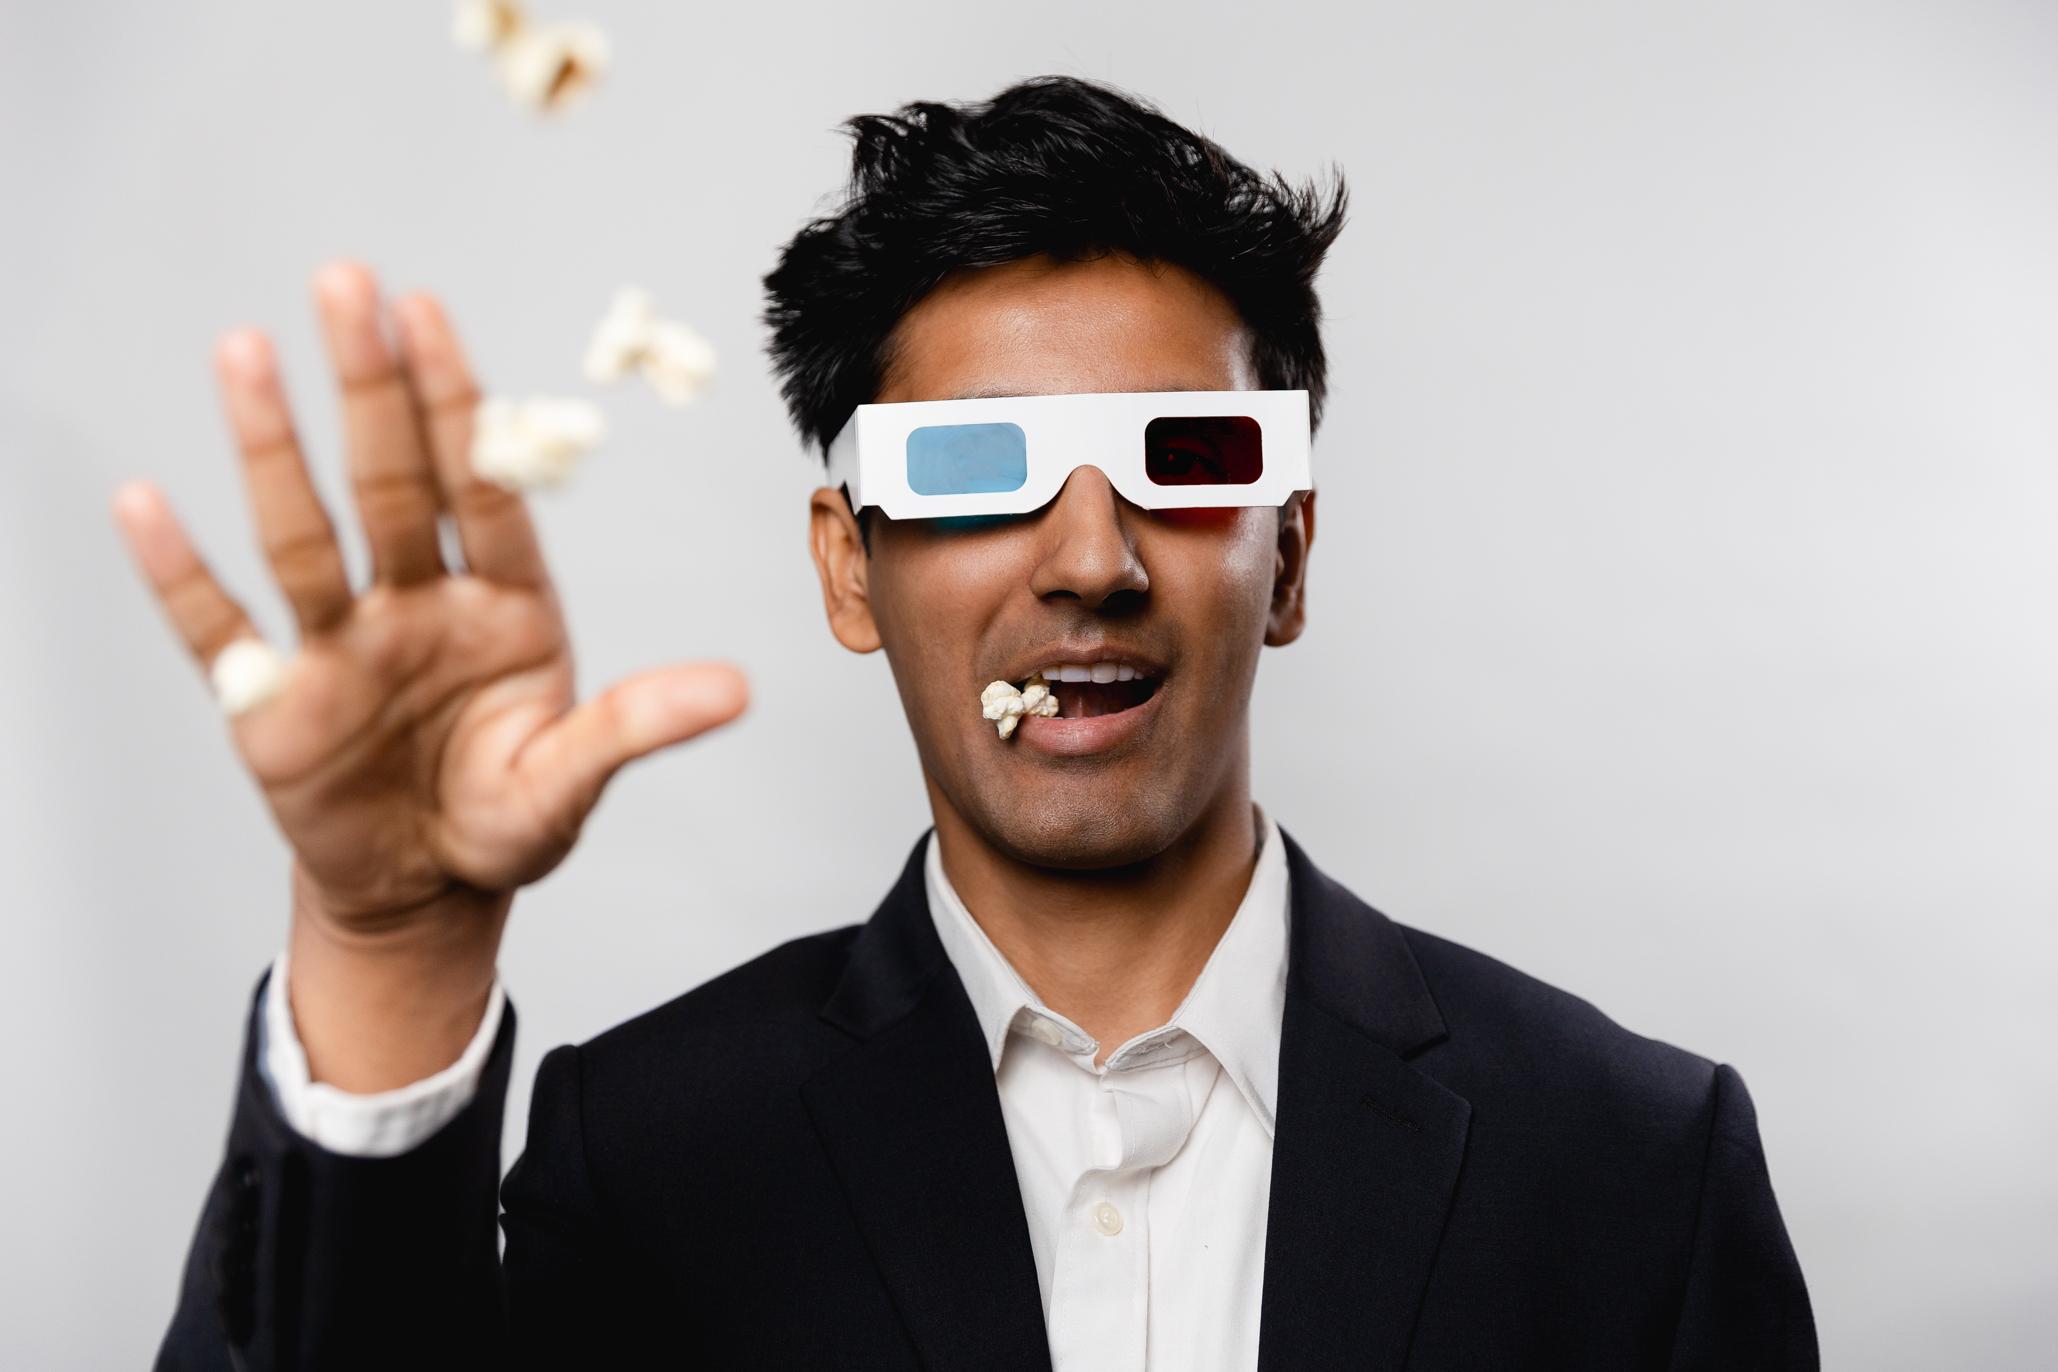 3d glasses popcorn headshot